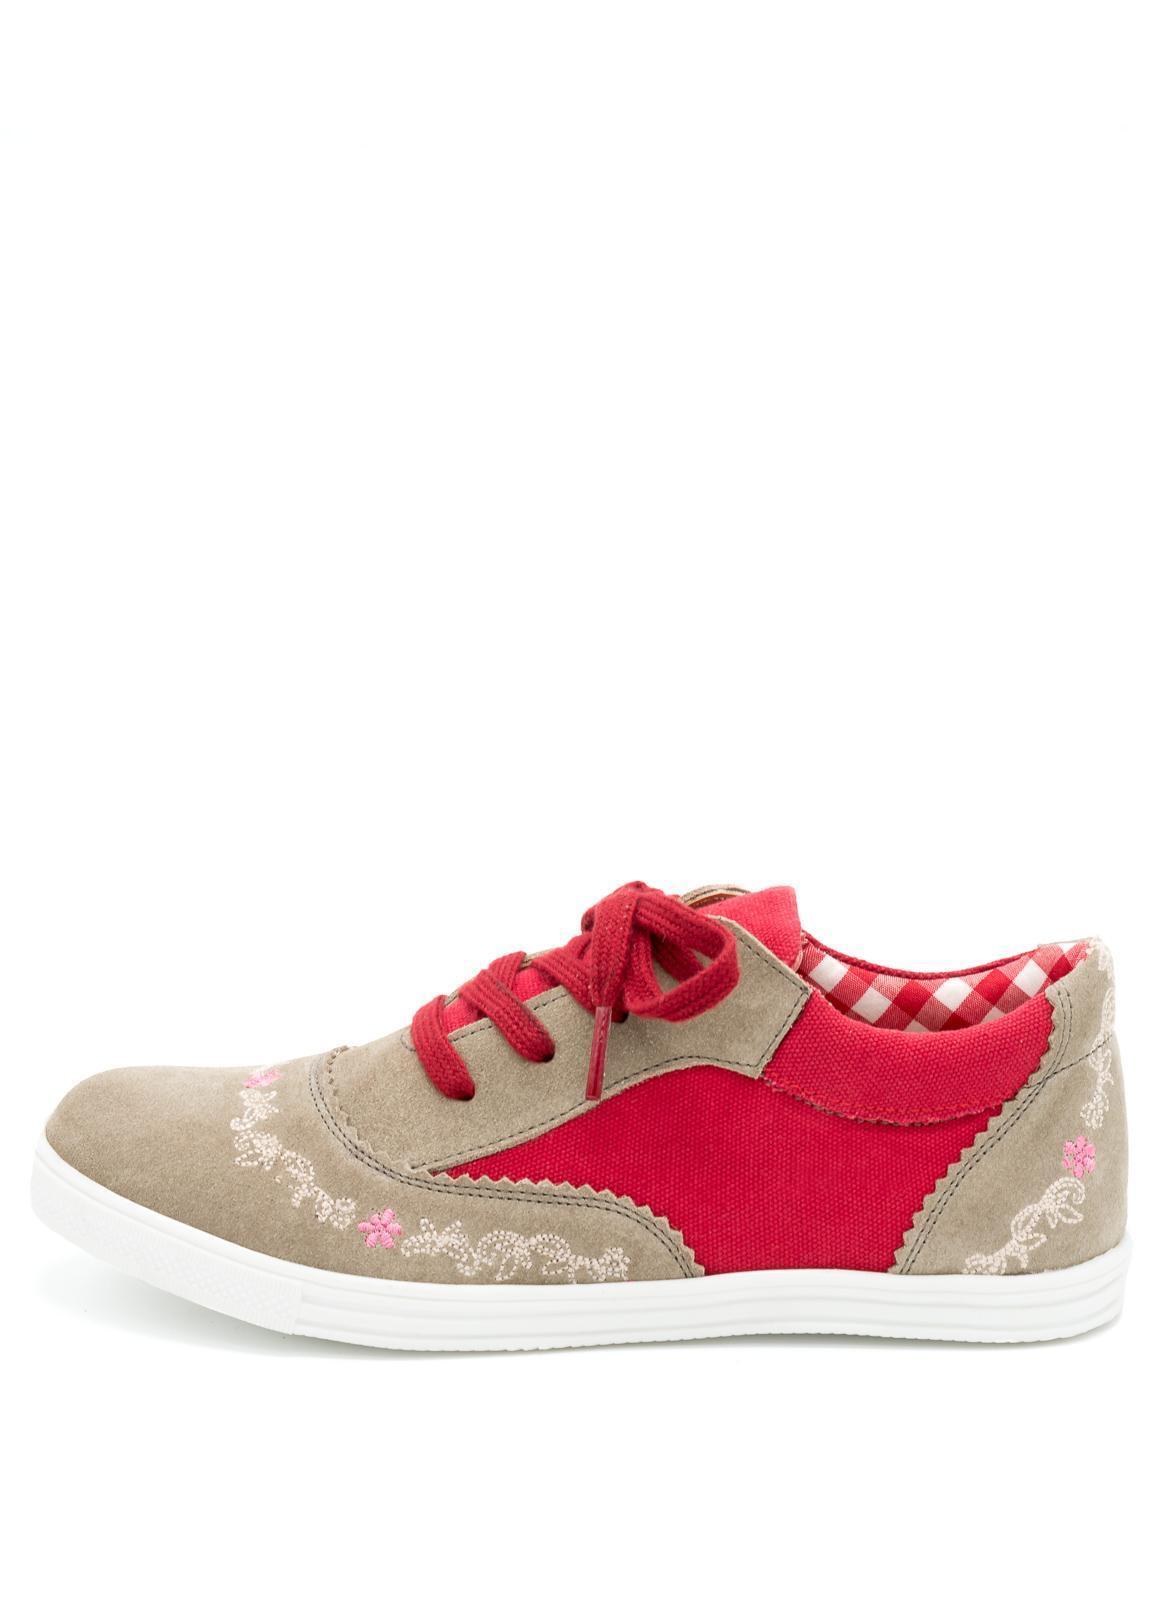 SPIETH & WENSKY-Sneaker donna, isola in rosso (030111-1275)